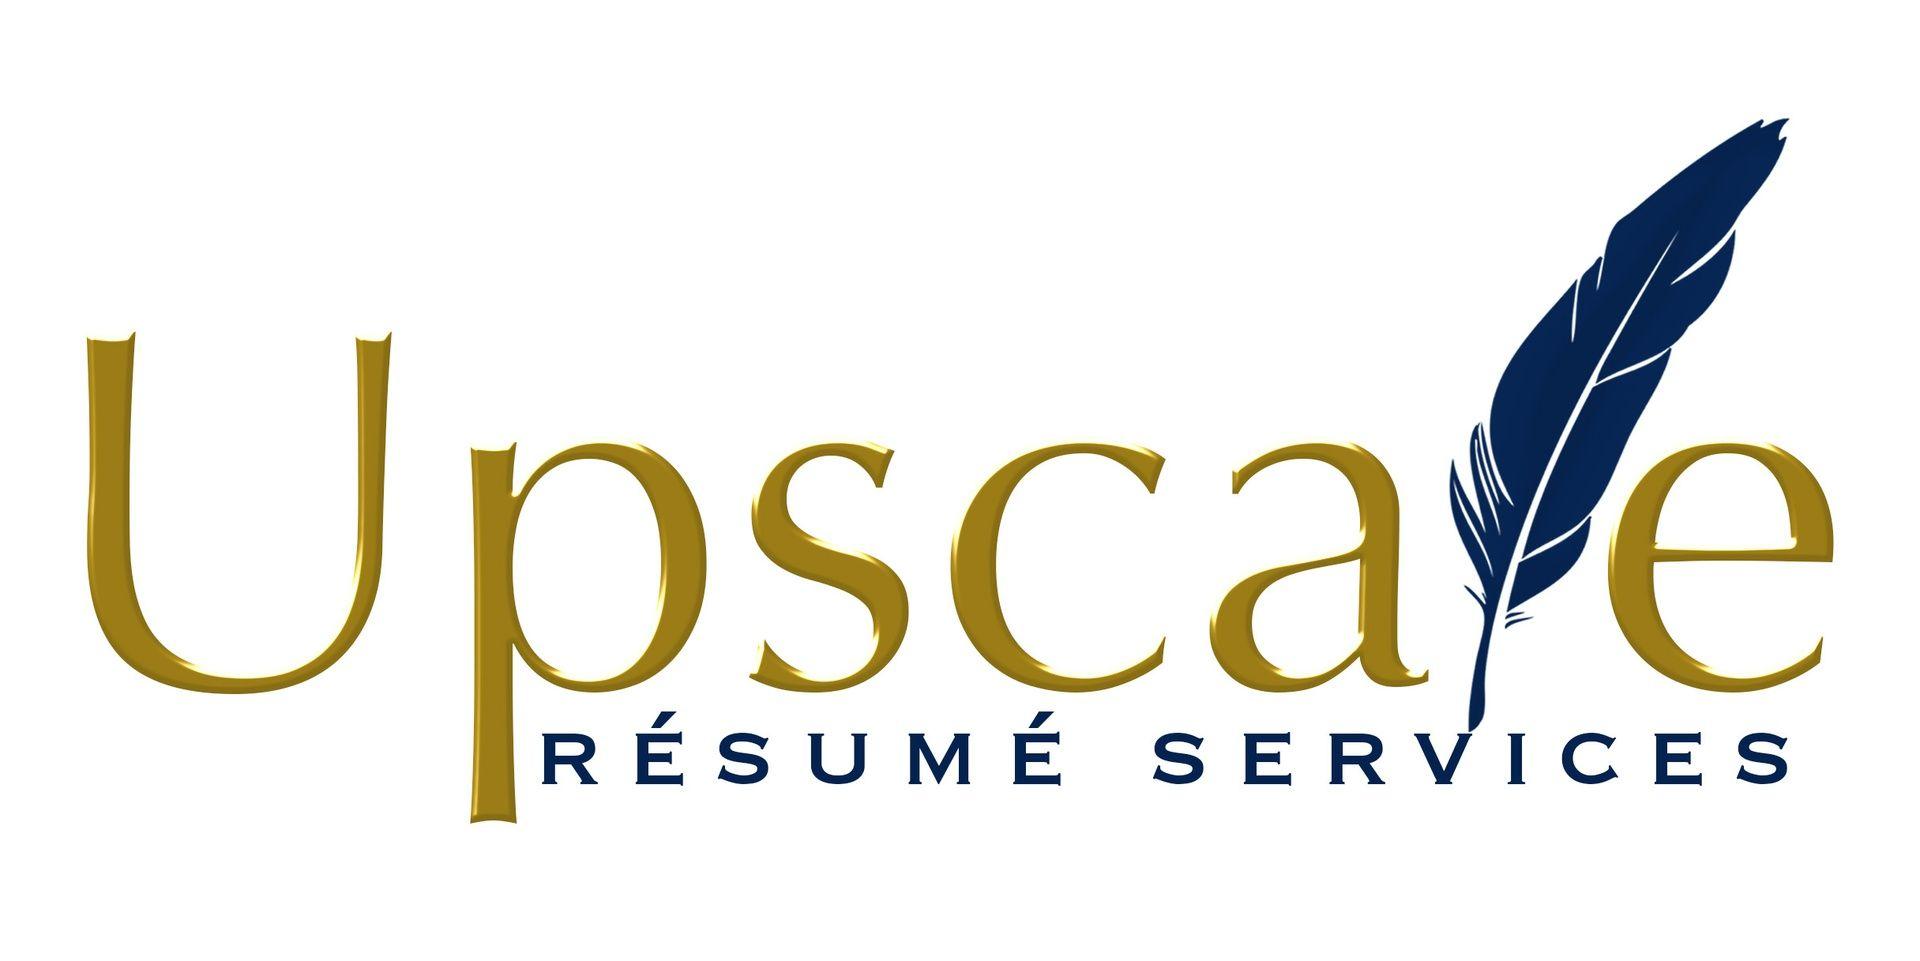 Resume services resume services resume tips resume